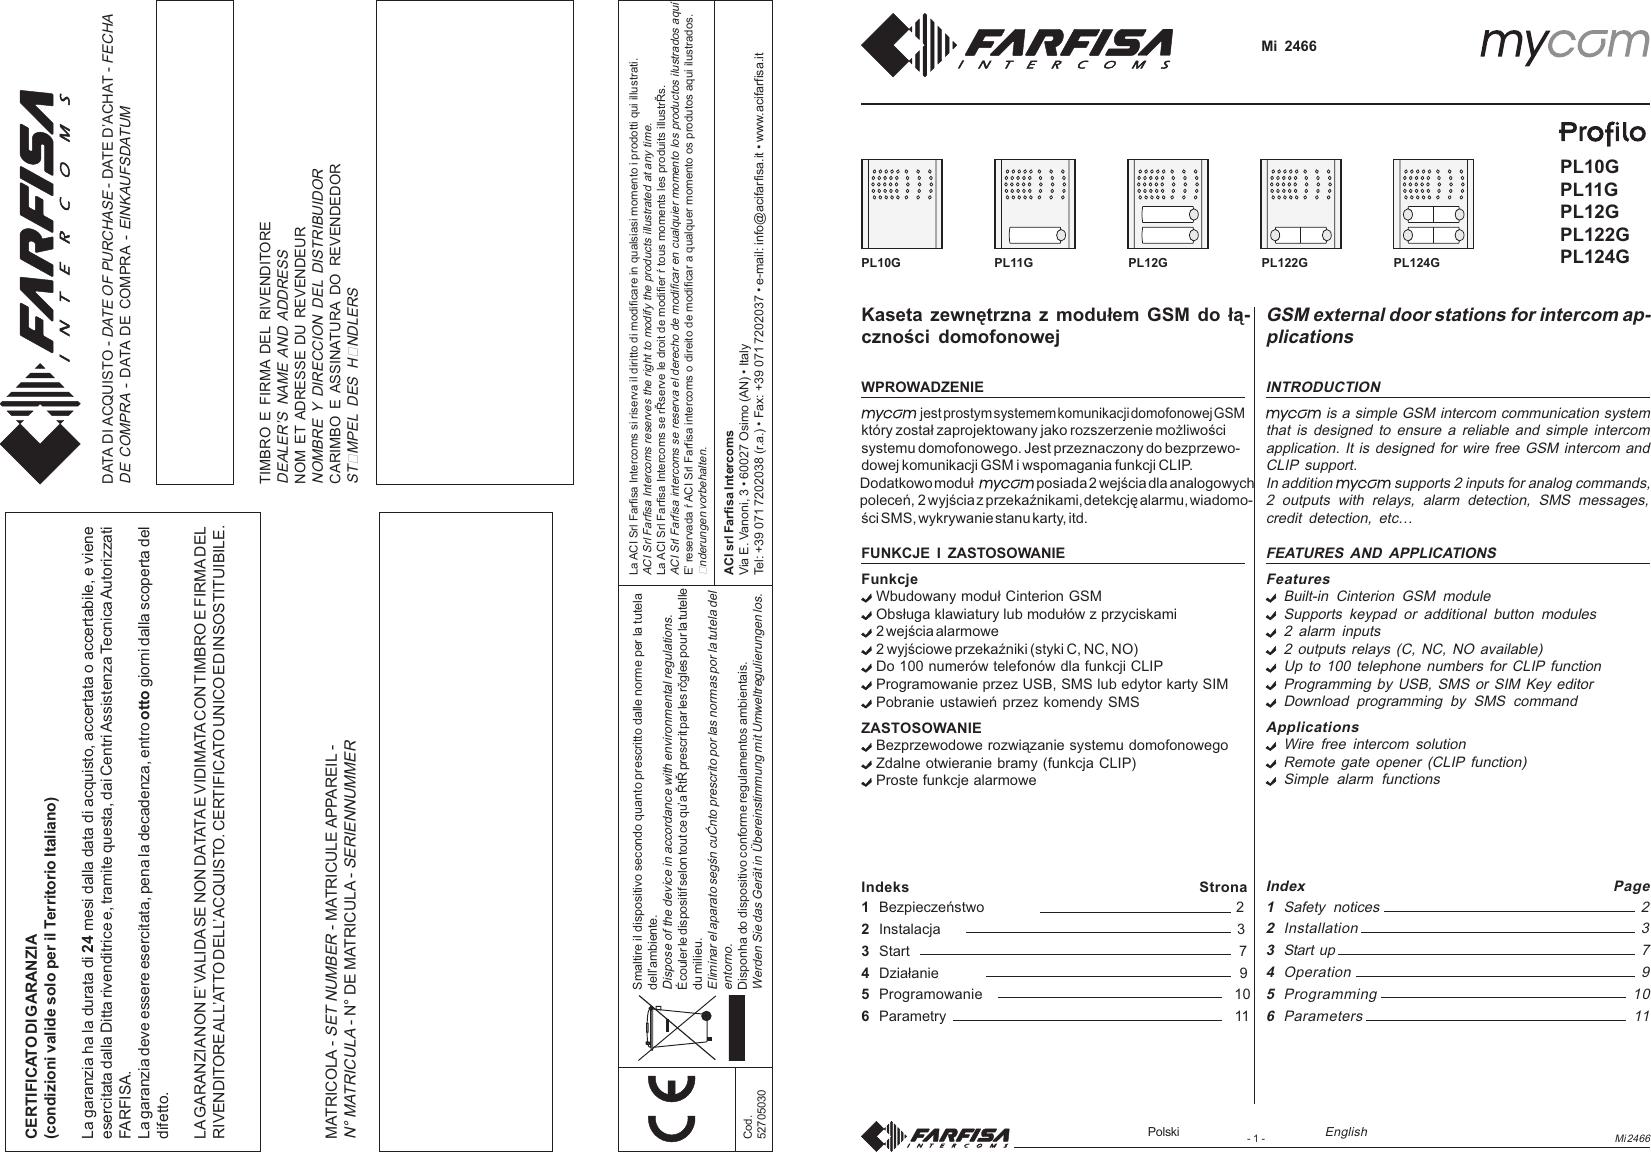 Rysunek12 Pl11g Mycom Inst Manual Pl11g Mycom Inst Manual